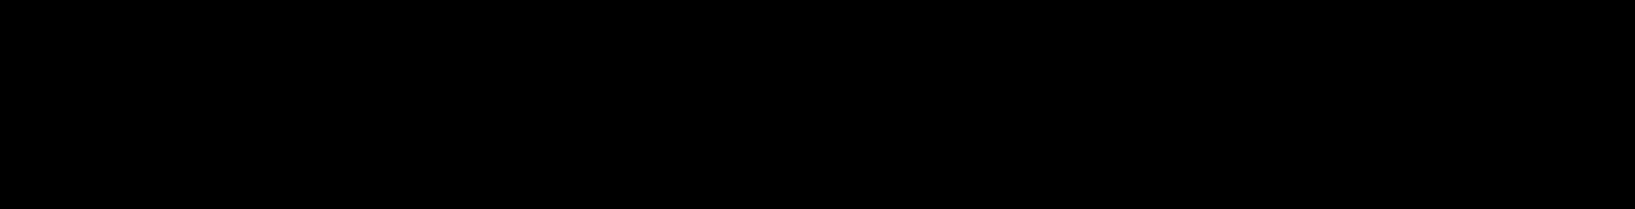 adversarial_constraint_eq1